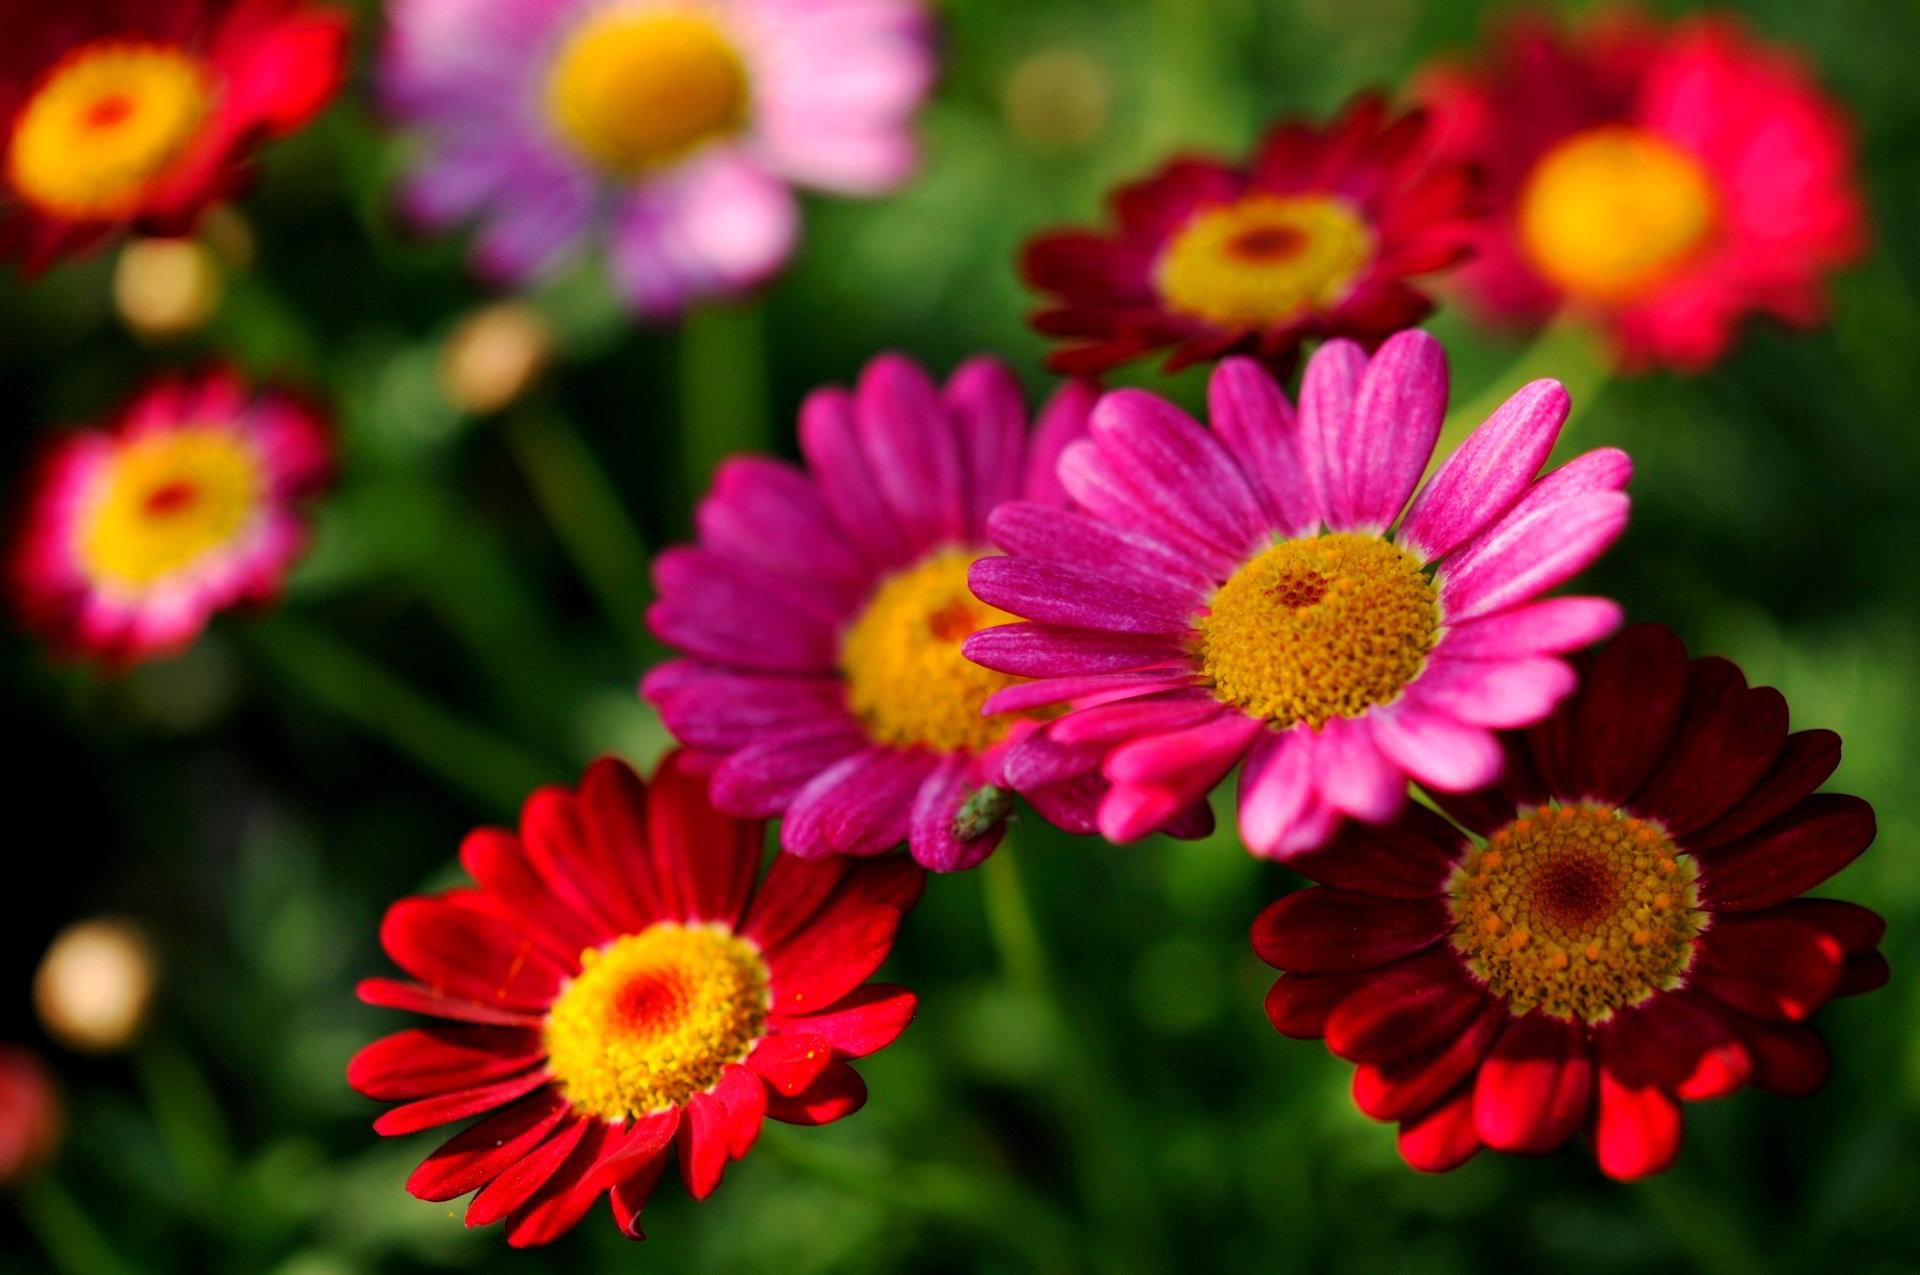 hinh anh hoa cuc dep 49